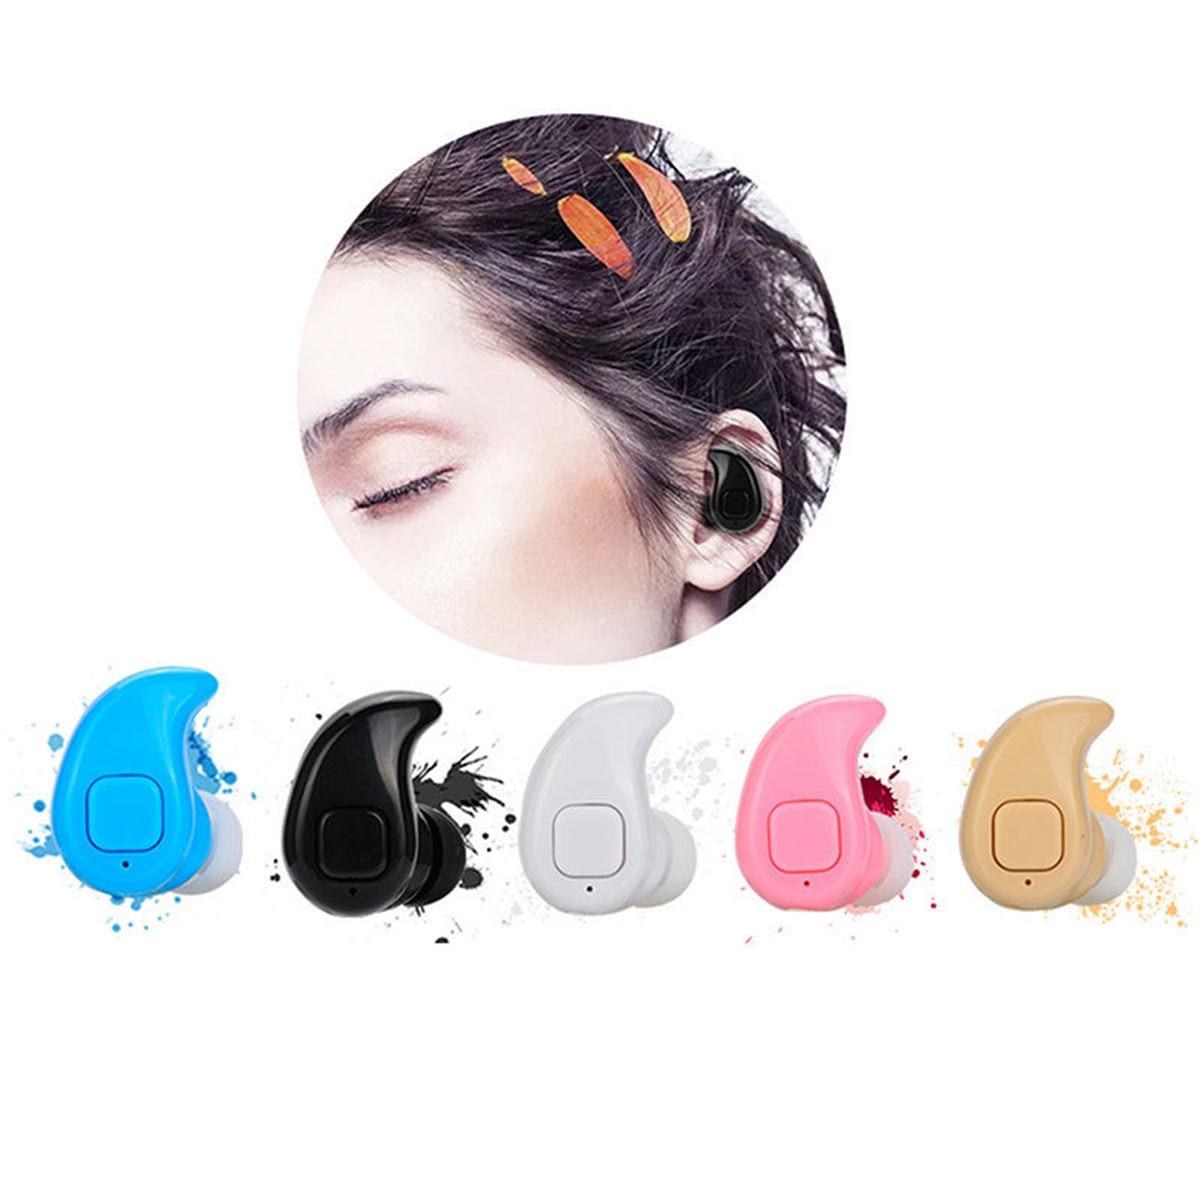 S530X auricular Bluetooth Mini auriculares inalámbricos Bluetooth V4.0 auricular Invisible portátil de una sola oreja estéreo para smartphone